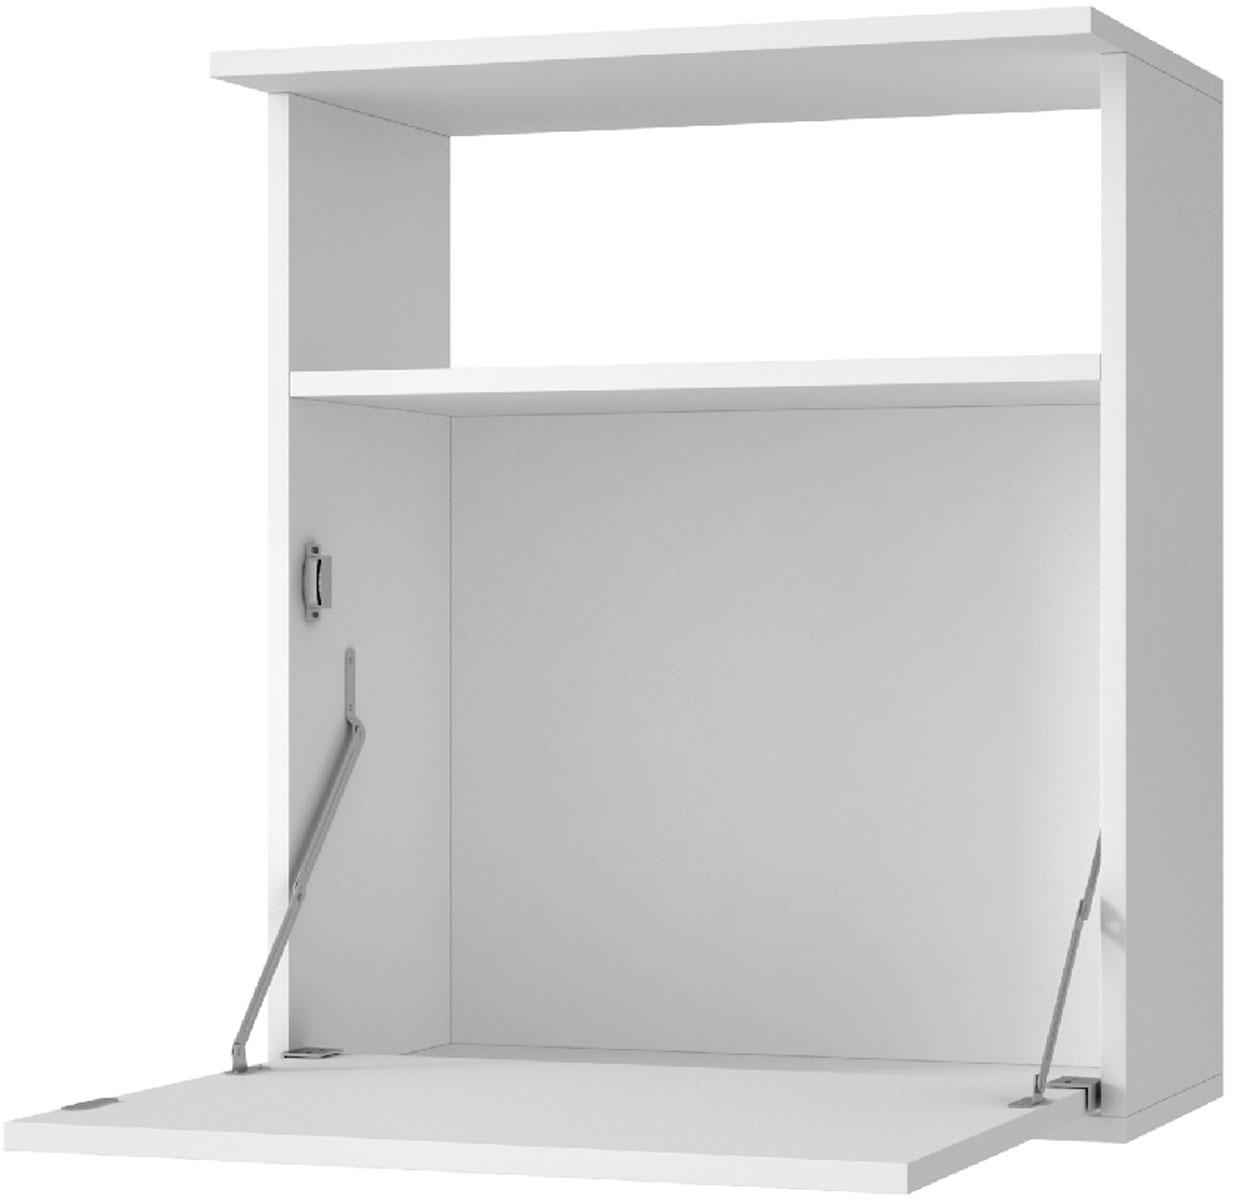 Шкаф Manhattan Comfort Asia, настенный, цвет: белый. BMU 21-06 asia home шкаф гуй